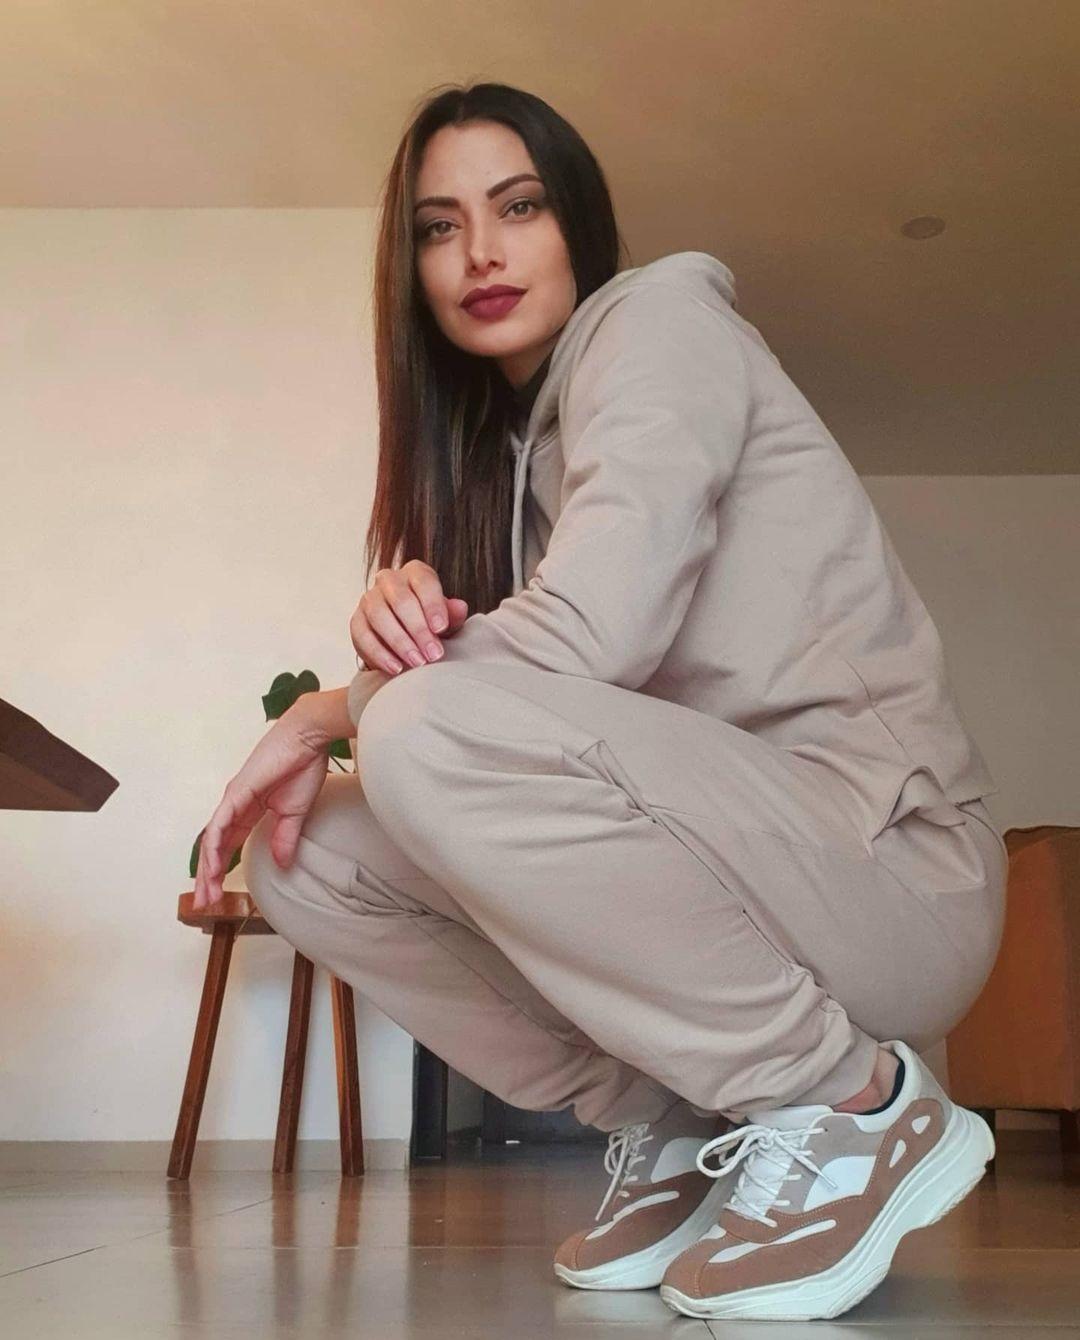 Alexia-Viruez-Wallpapers-Insta-Fit-Bio-1